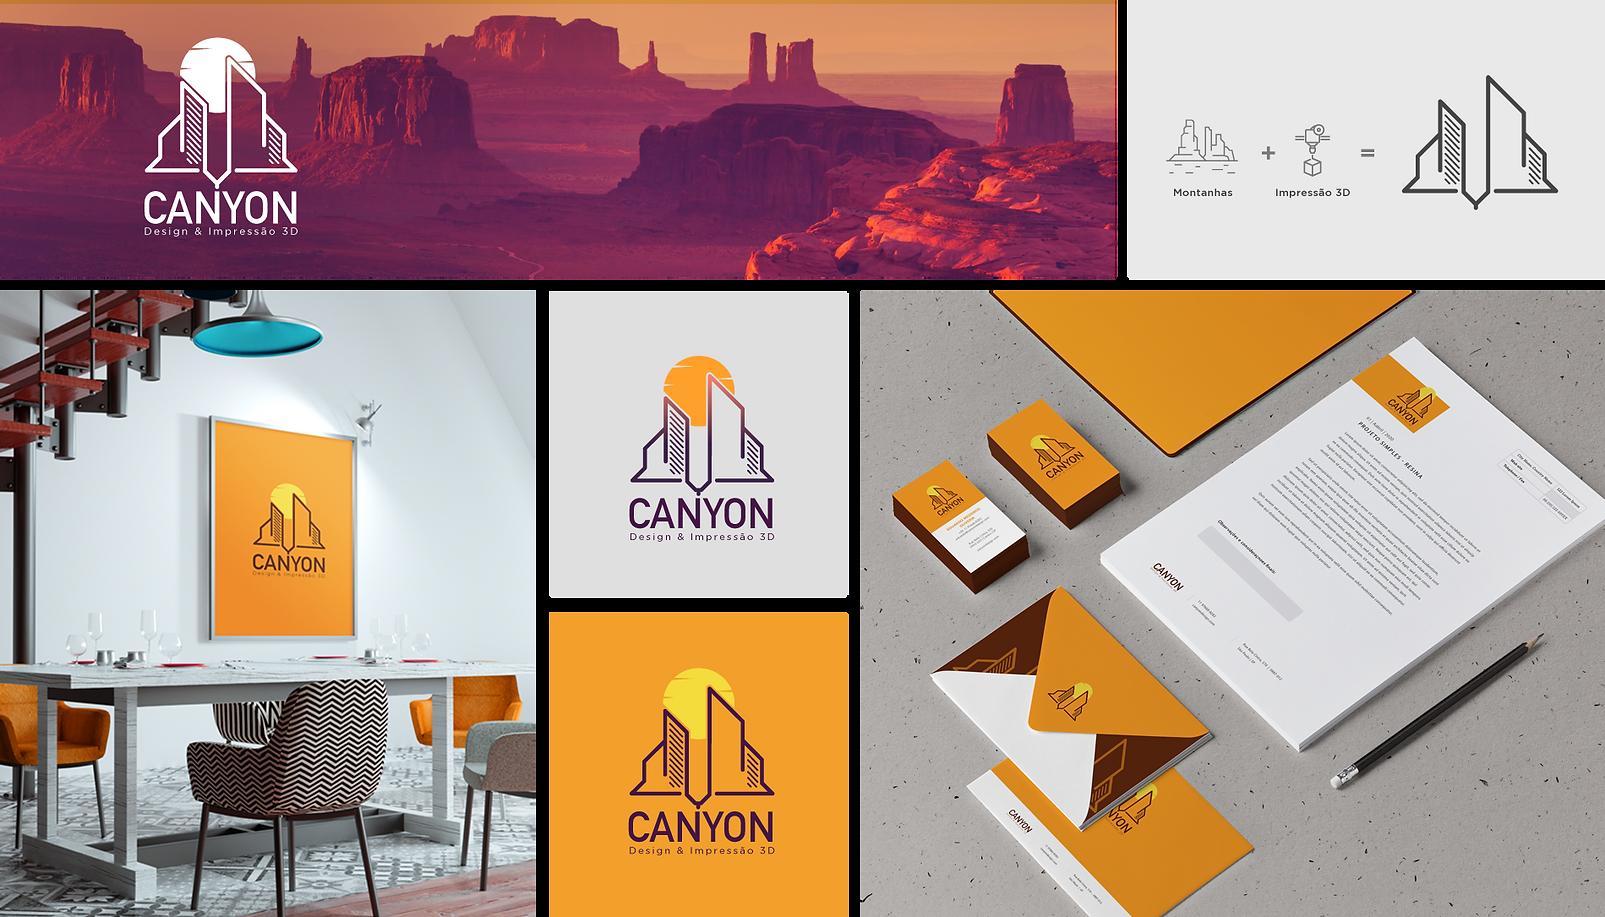 Canyon_Imagem_Artes.png